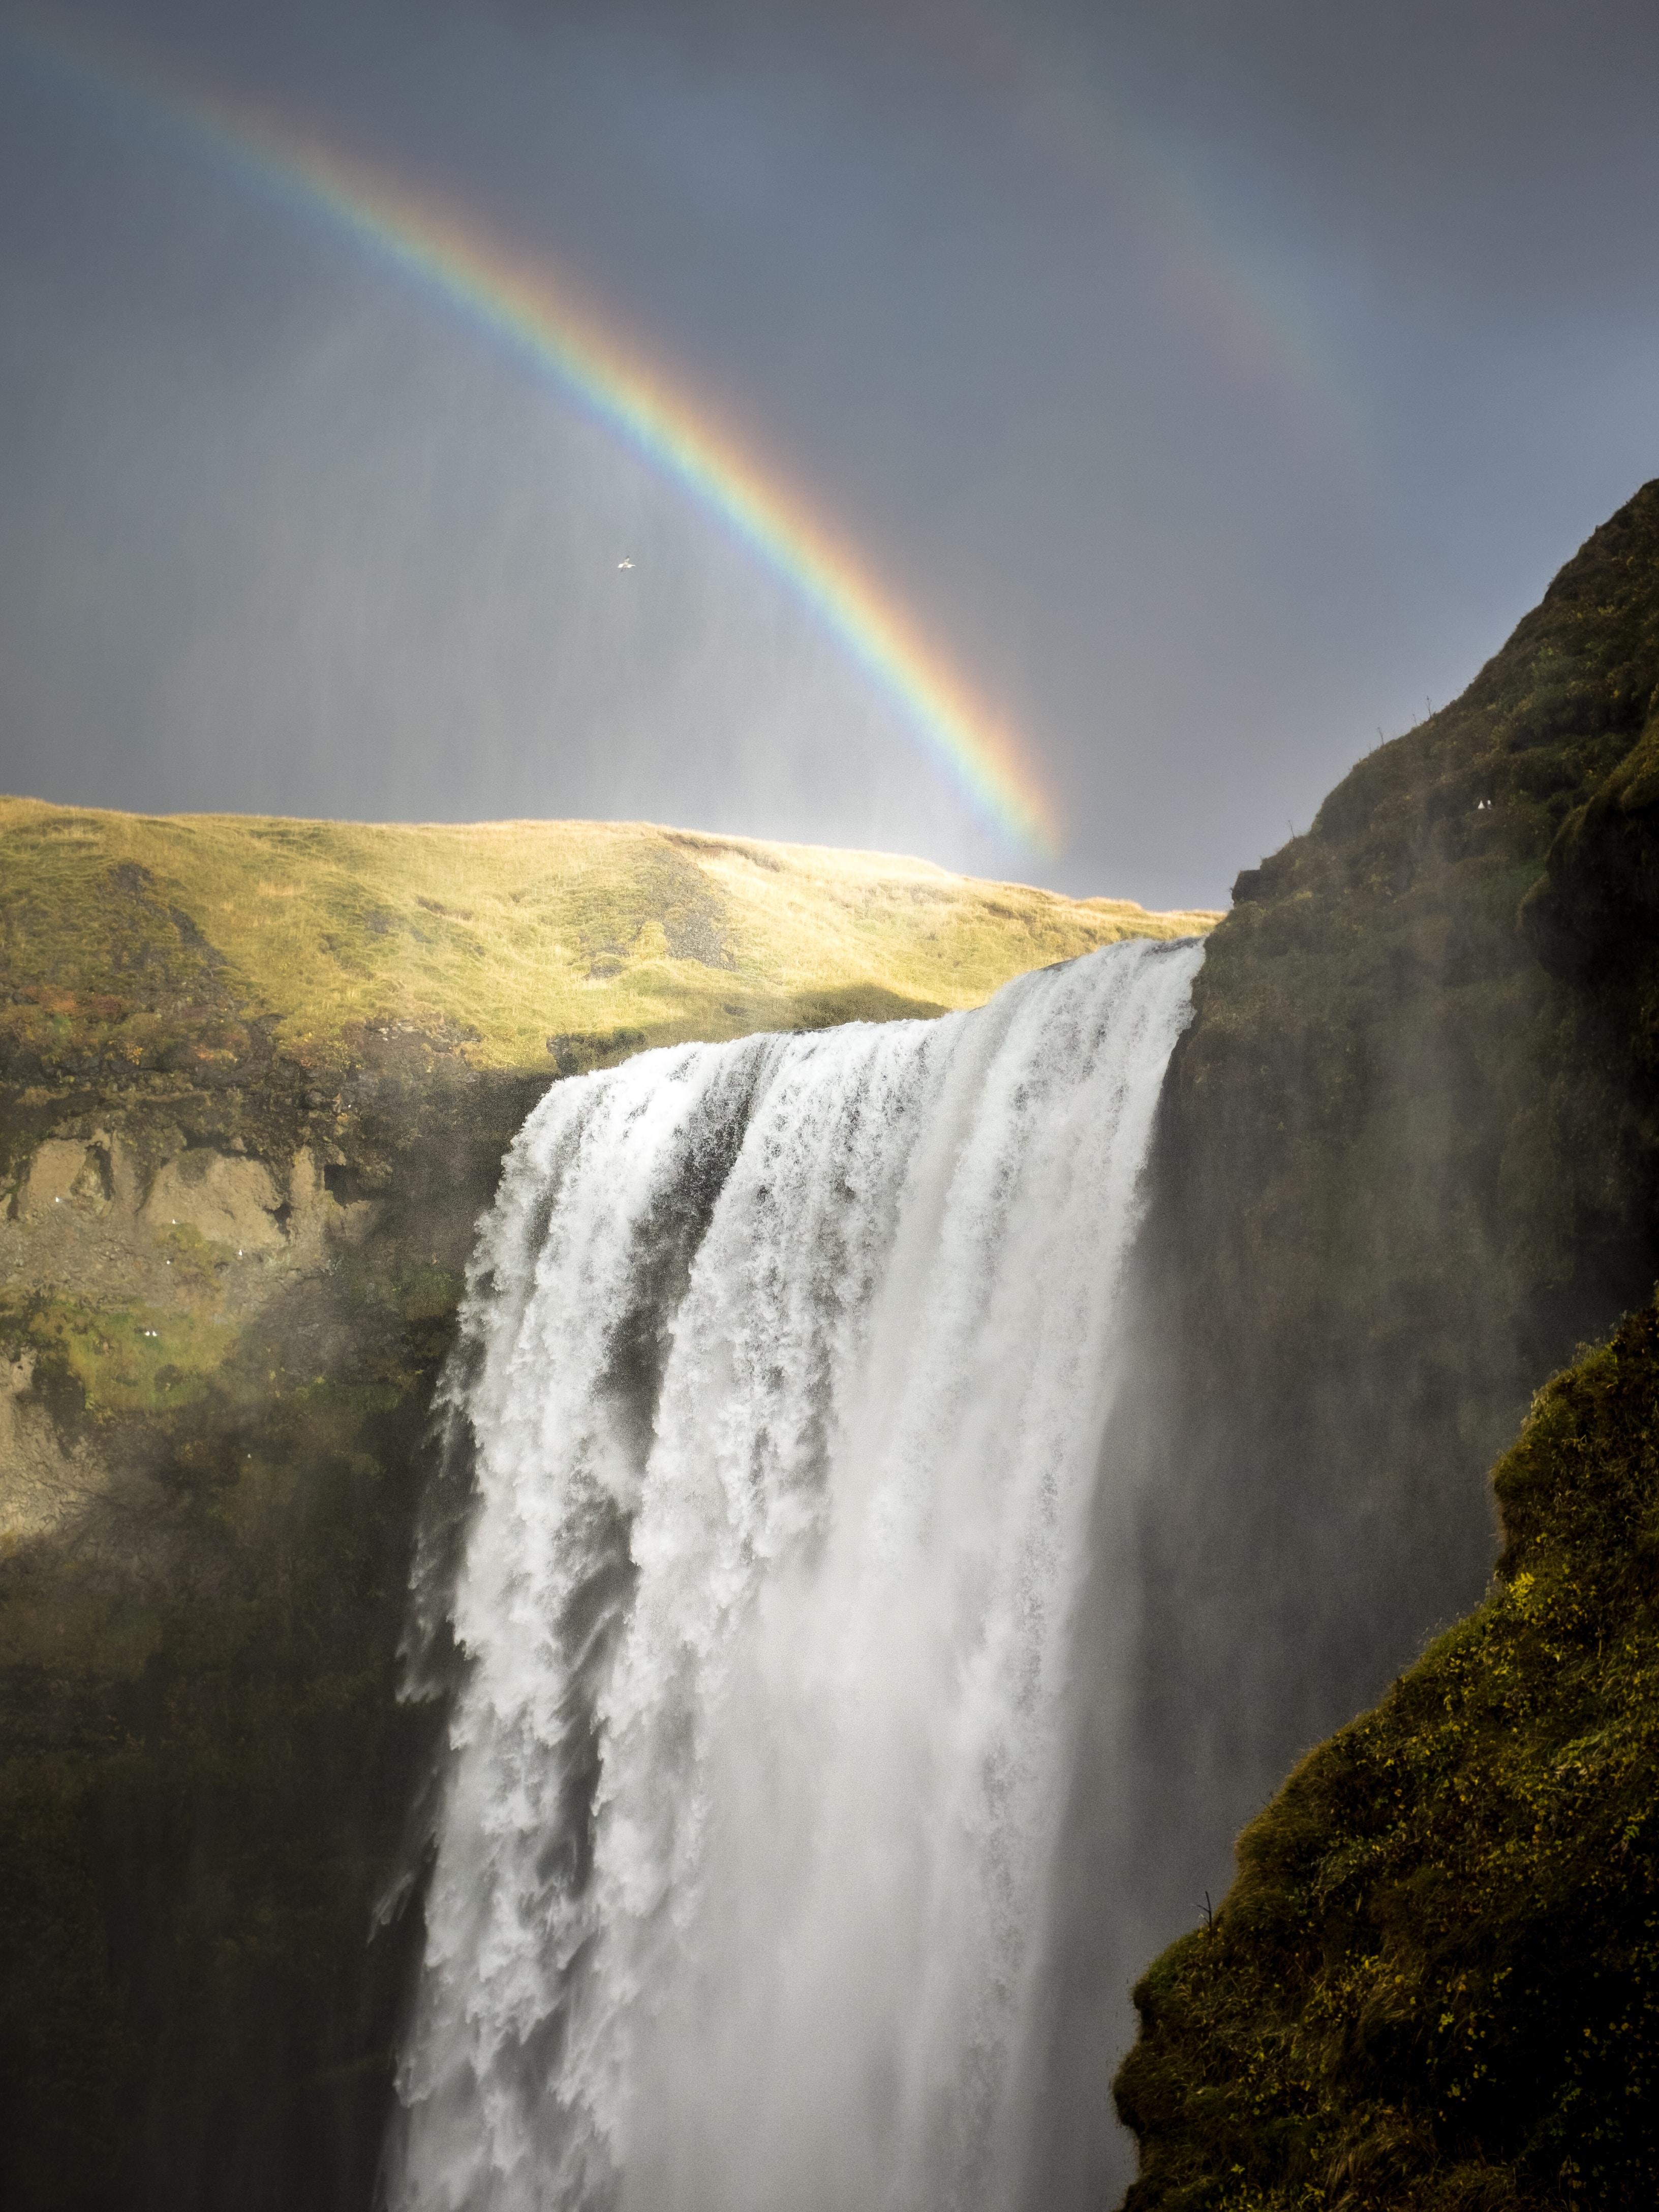 Kaietuer waterfalls